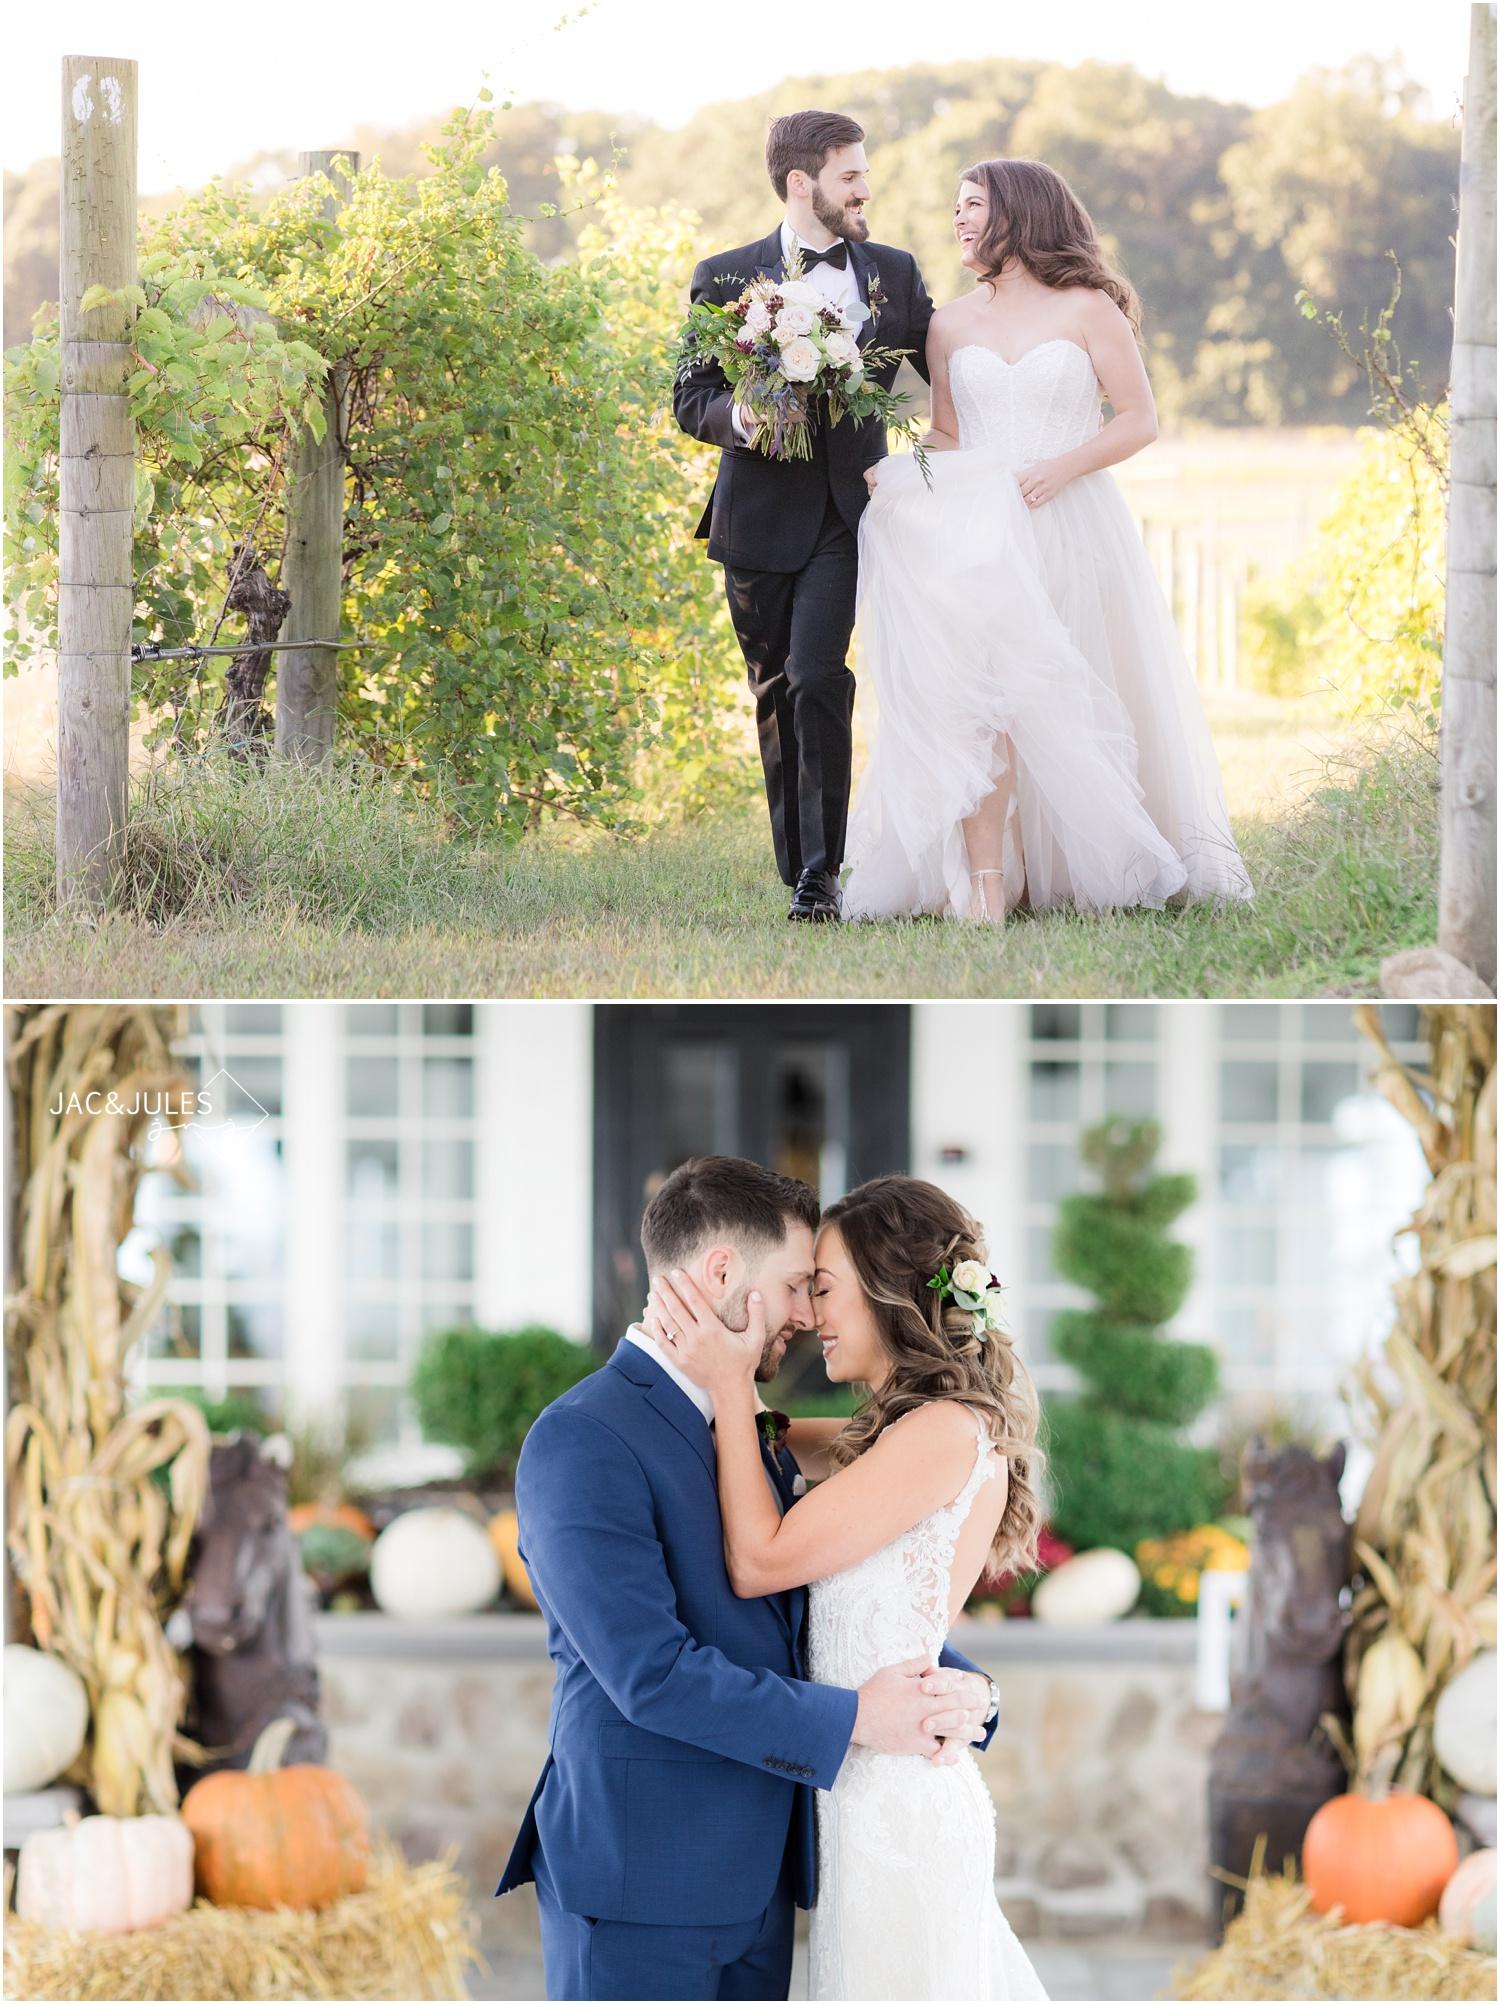 Fun winery wedding photo from Laurita Winery, and cozy fall Ryland Inn wedding photos.